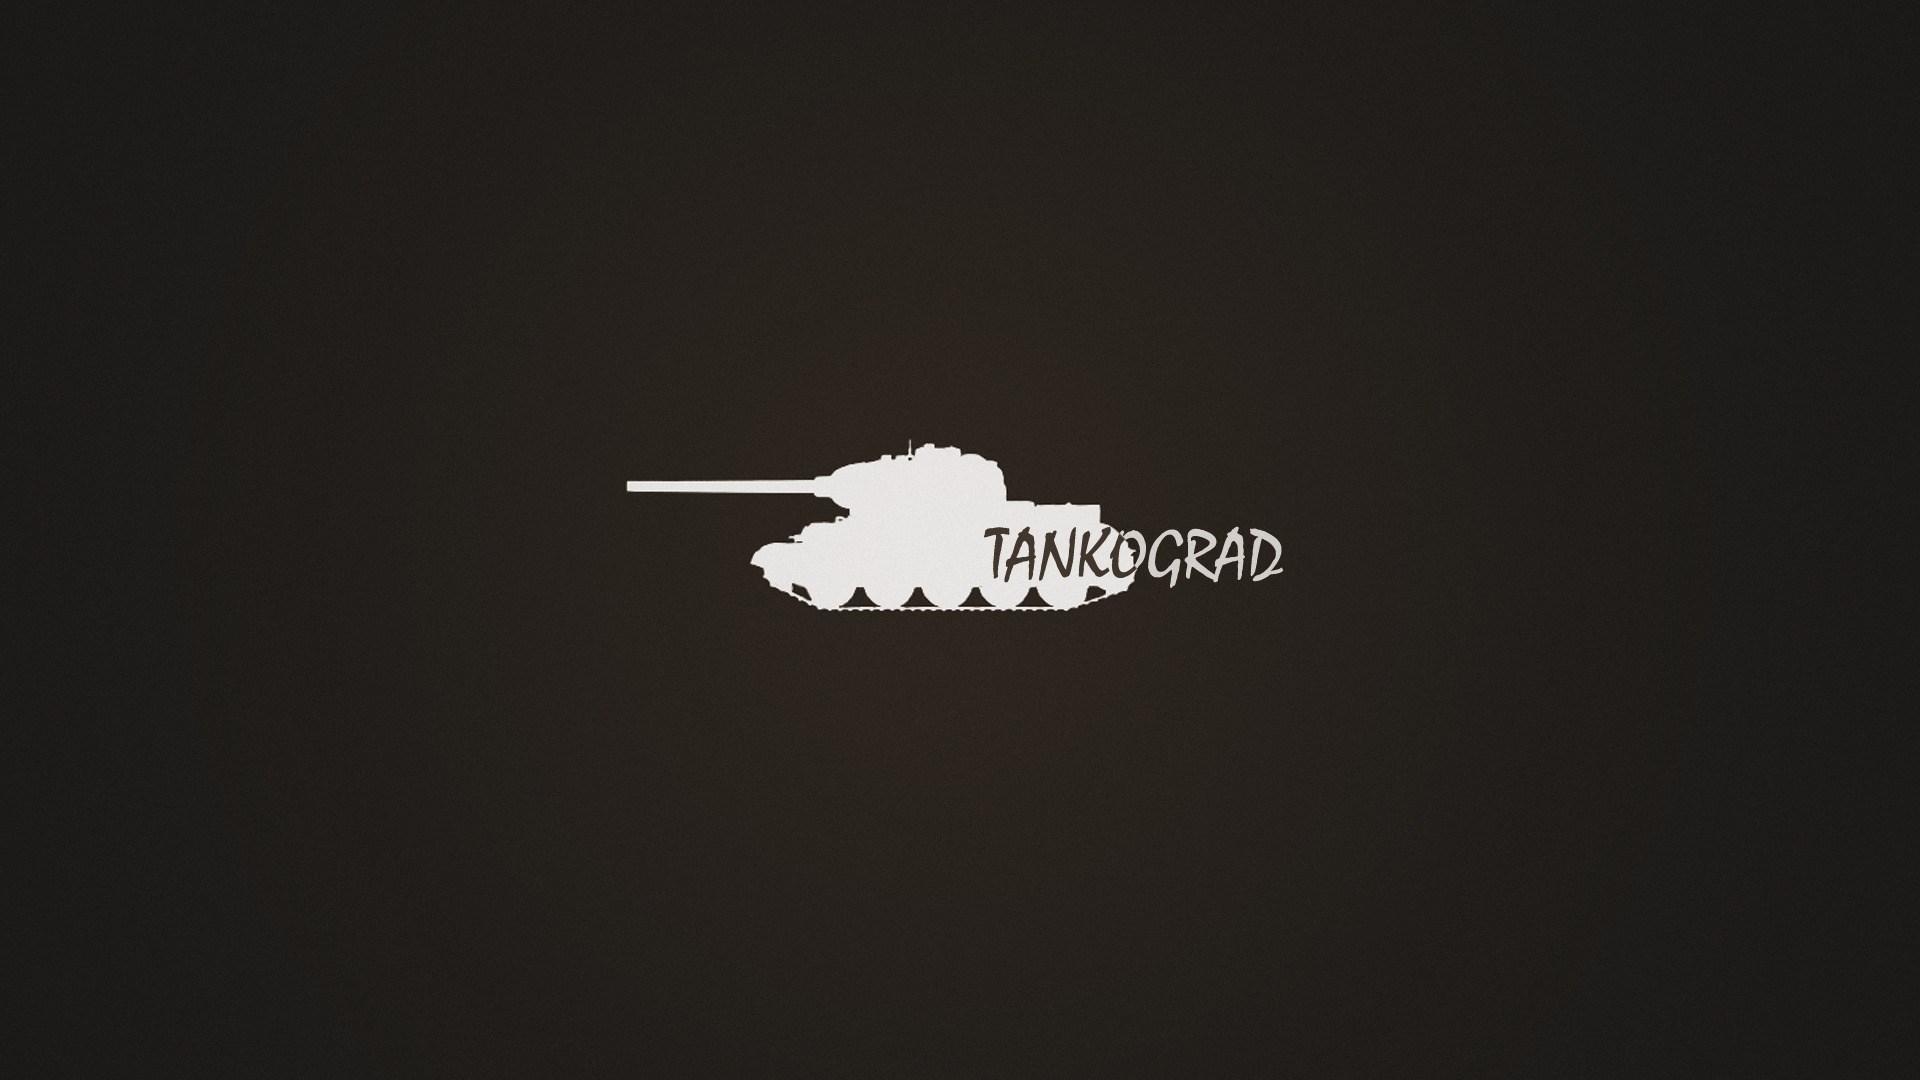 Tankograd Tank Creative